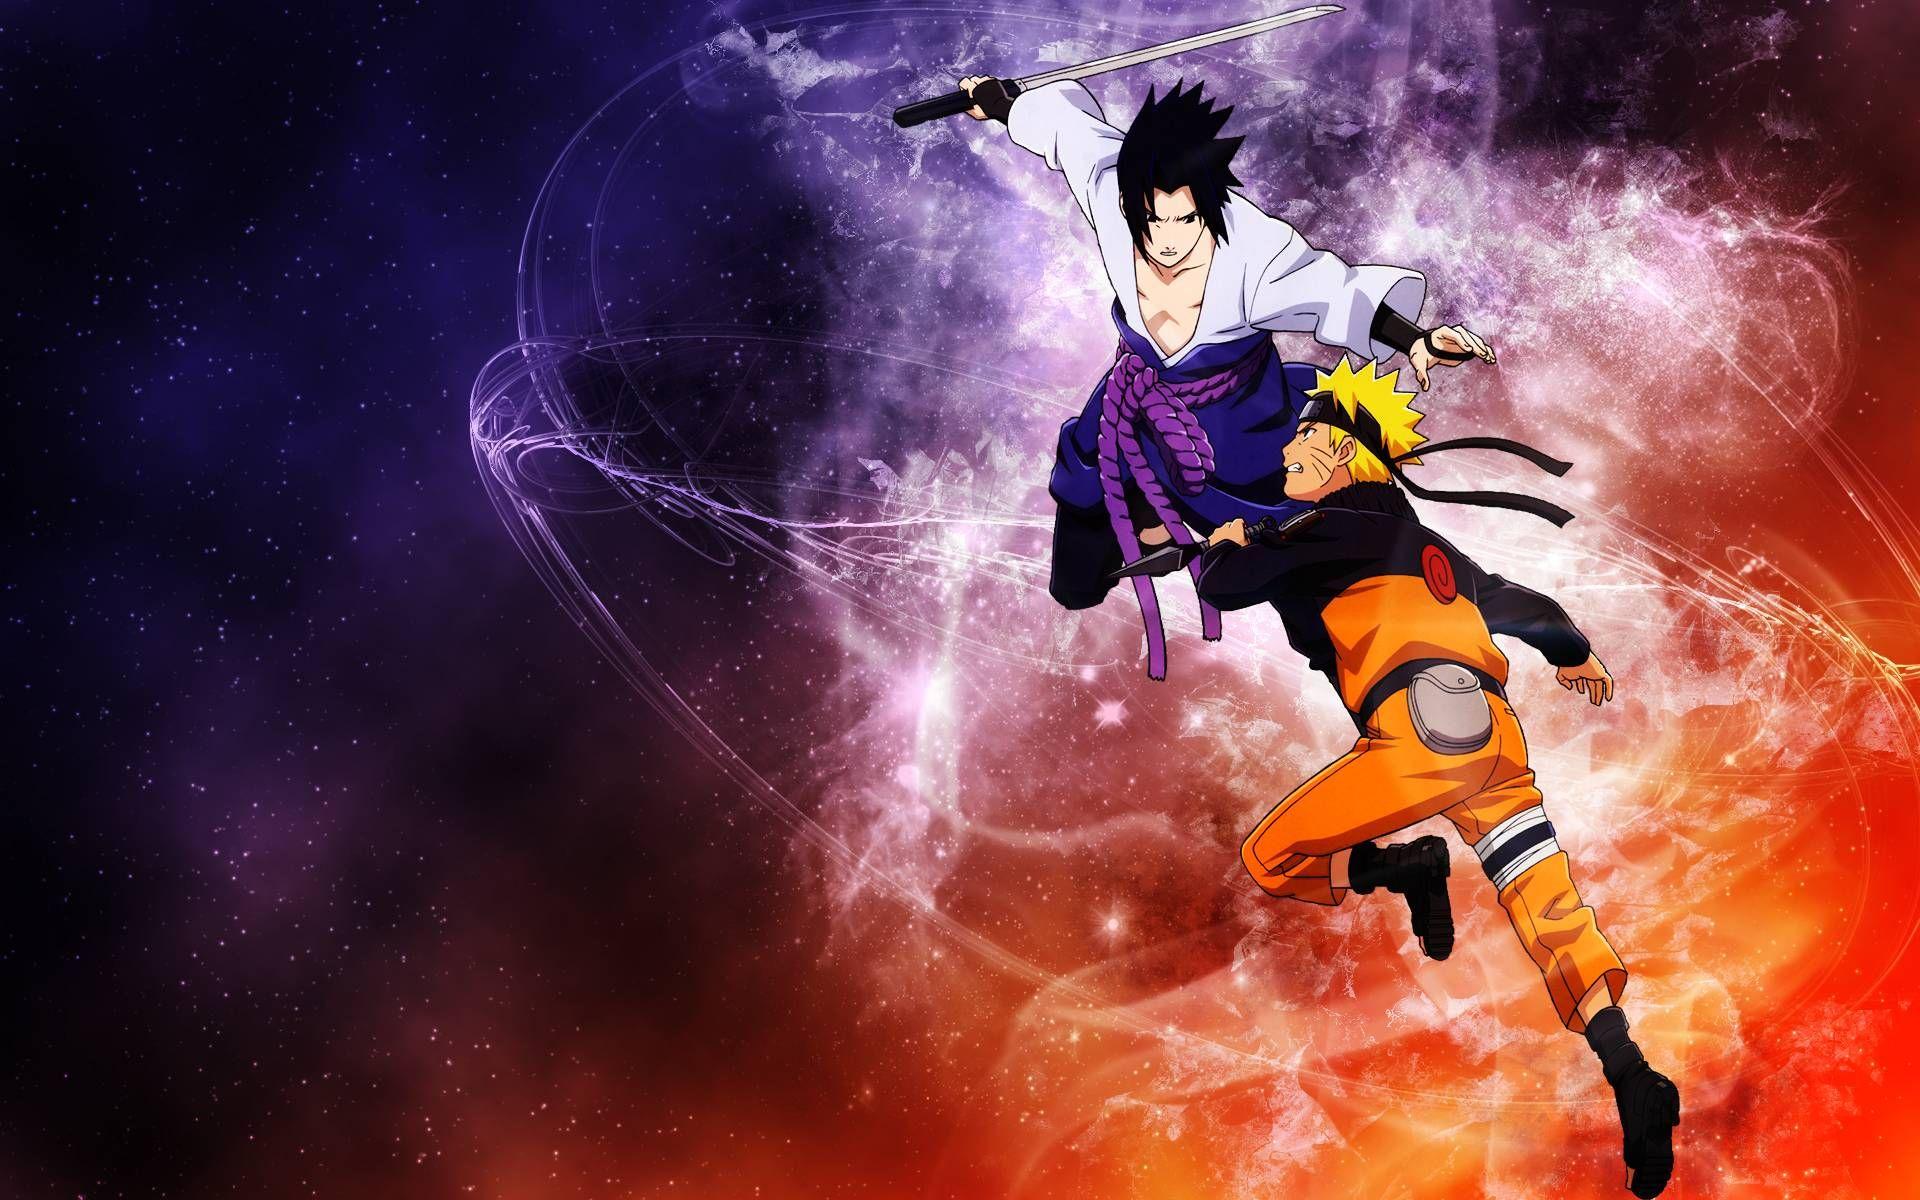 Hd wallpaper naruto - Naruto Hd Wallpapers And Backgrounds